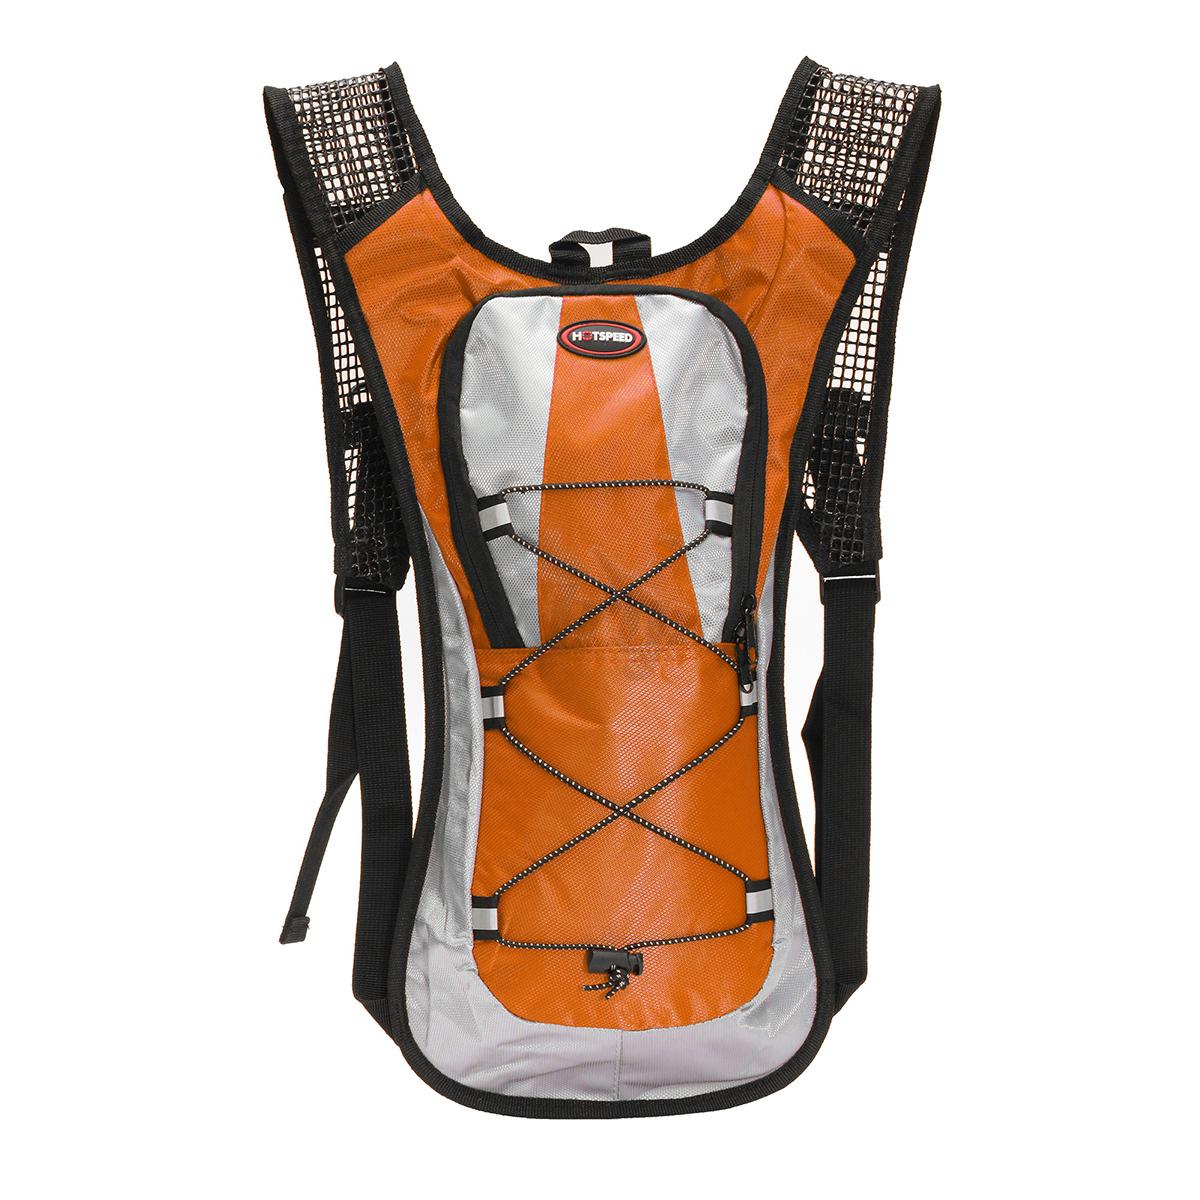 2L Water Bladder Bag Backpack Hydration Packs Outdoor ...